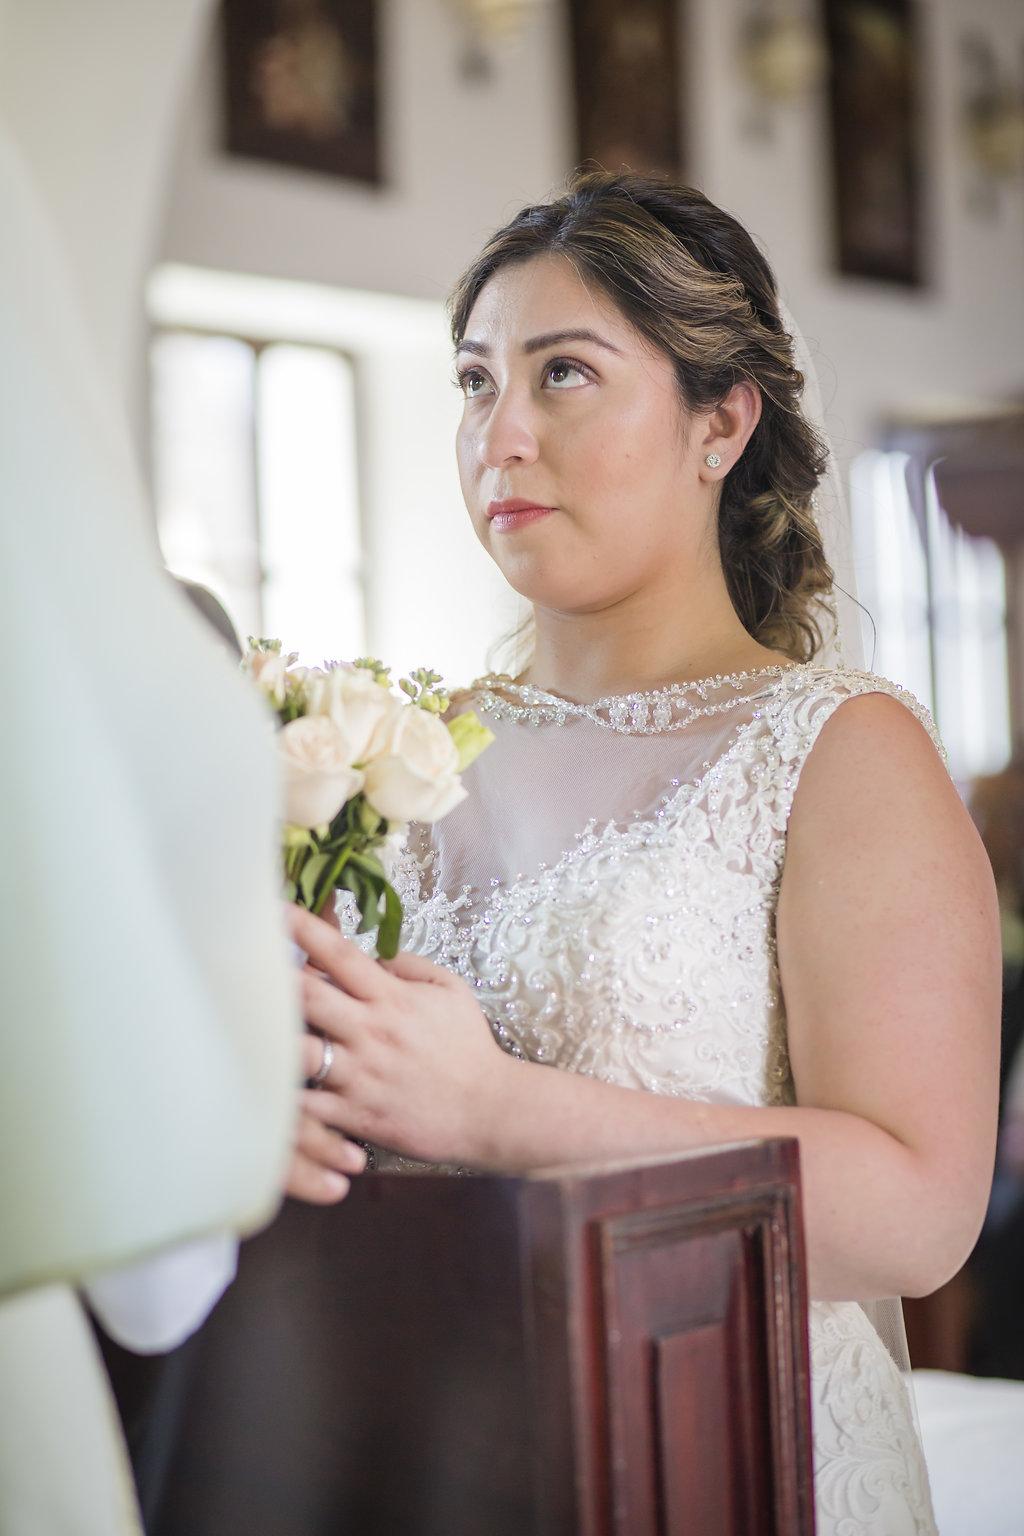 yesica-jose-beach-wedding-Villa-La-Joya--Playa-del-carmen-01--10.jpg